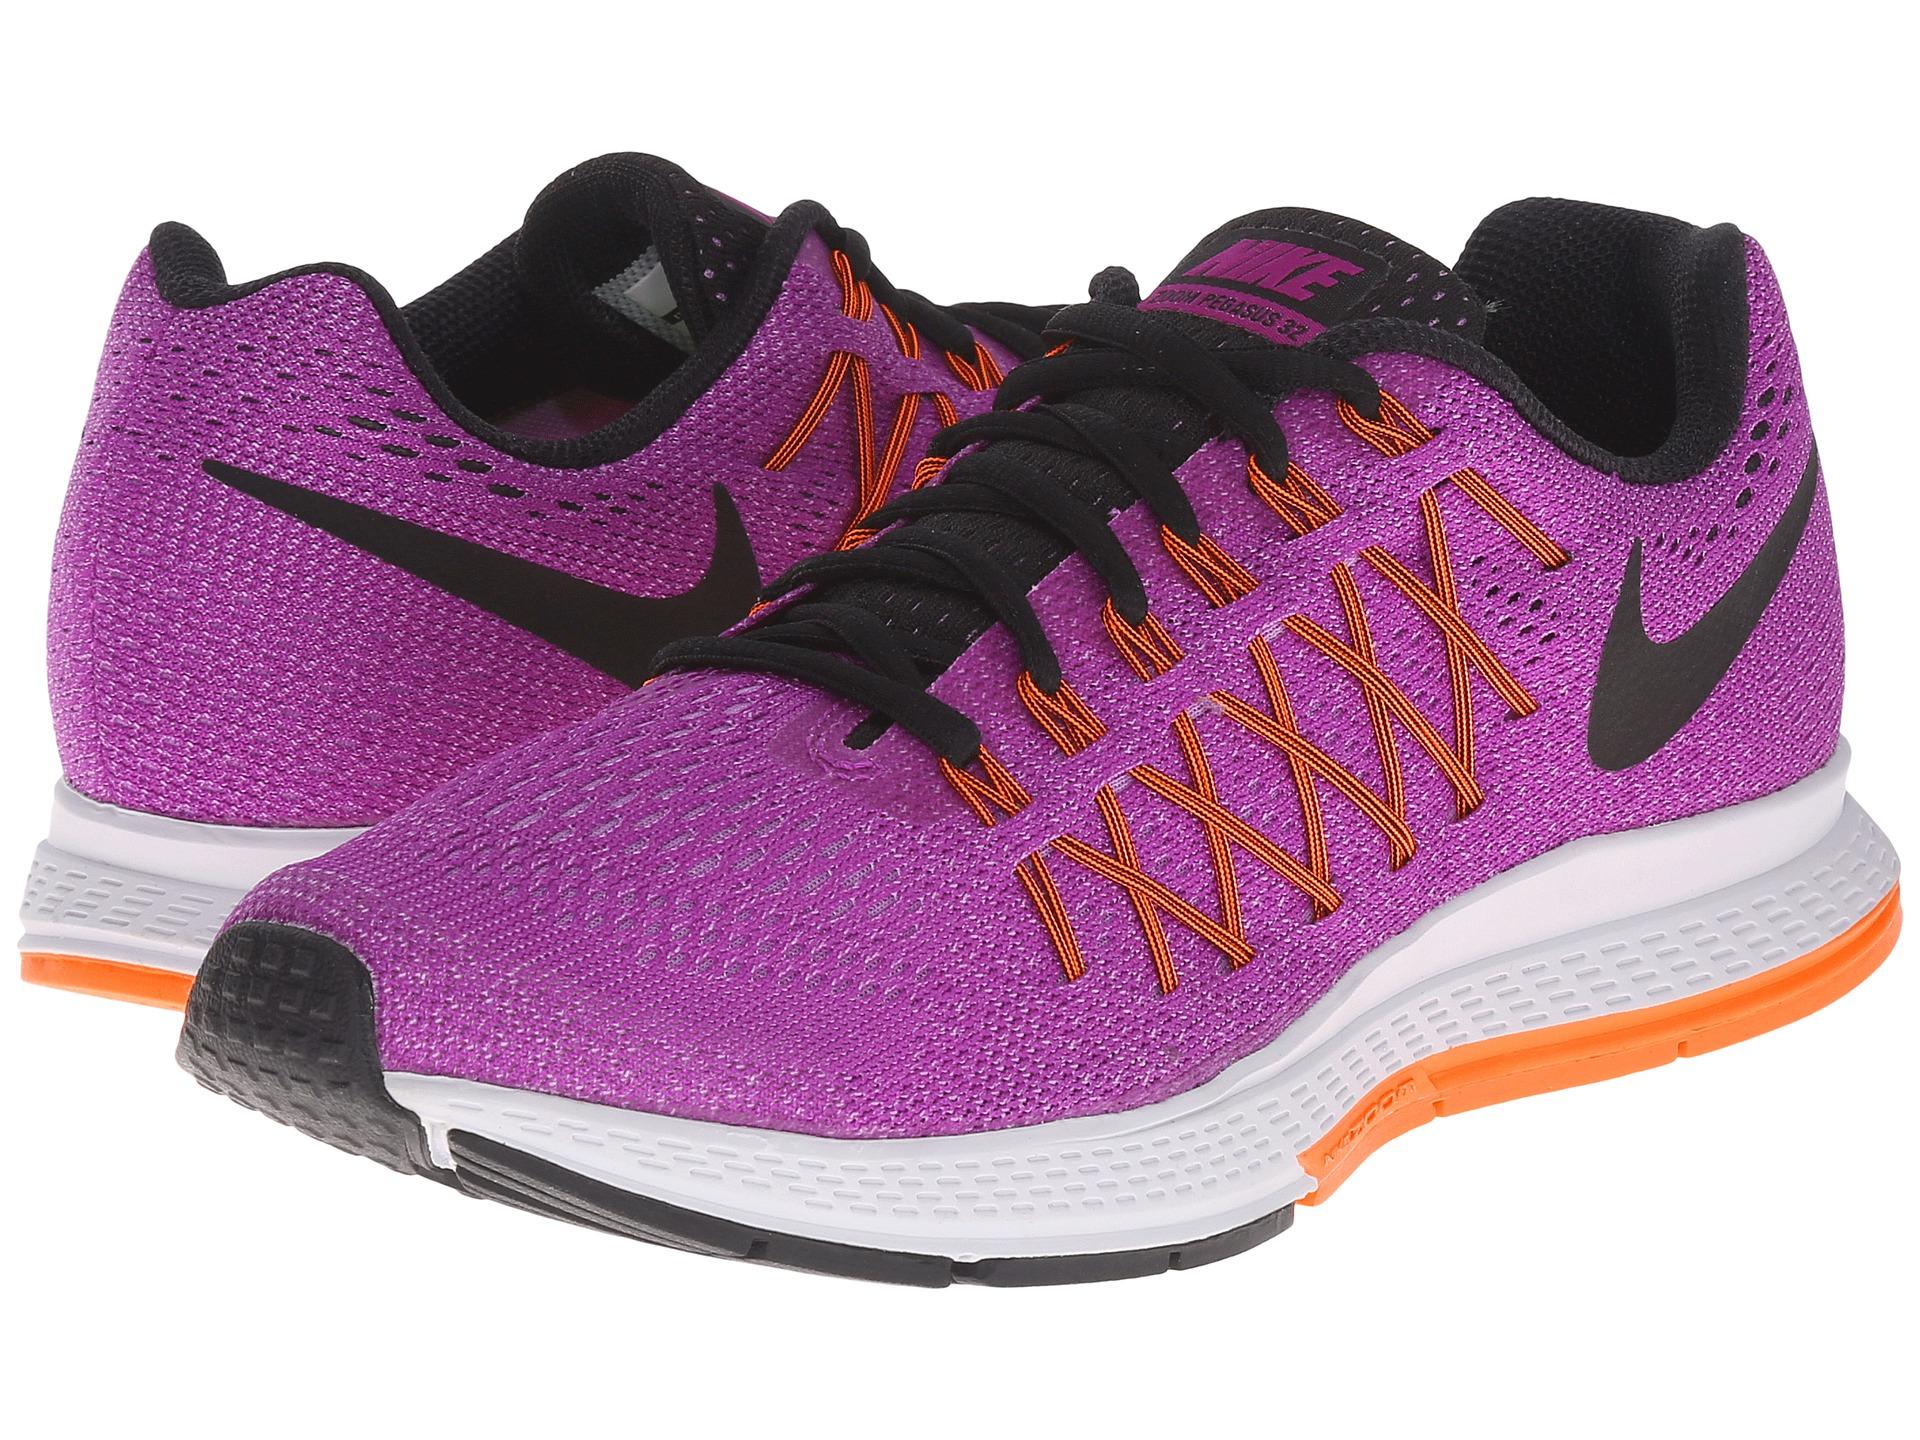 online store ad272 490ce ... order lyst nike air zoom pegasus 32 in purple 61fda be3c6